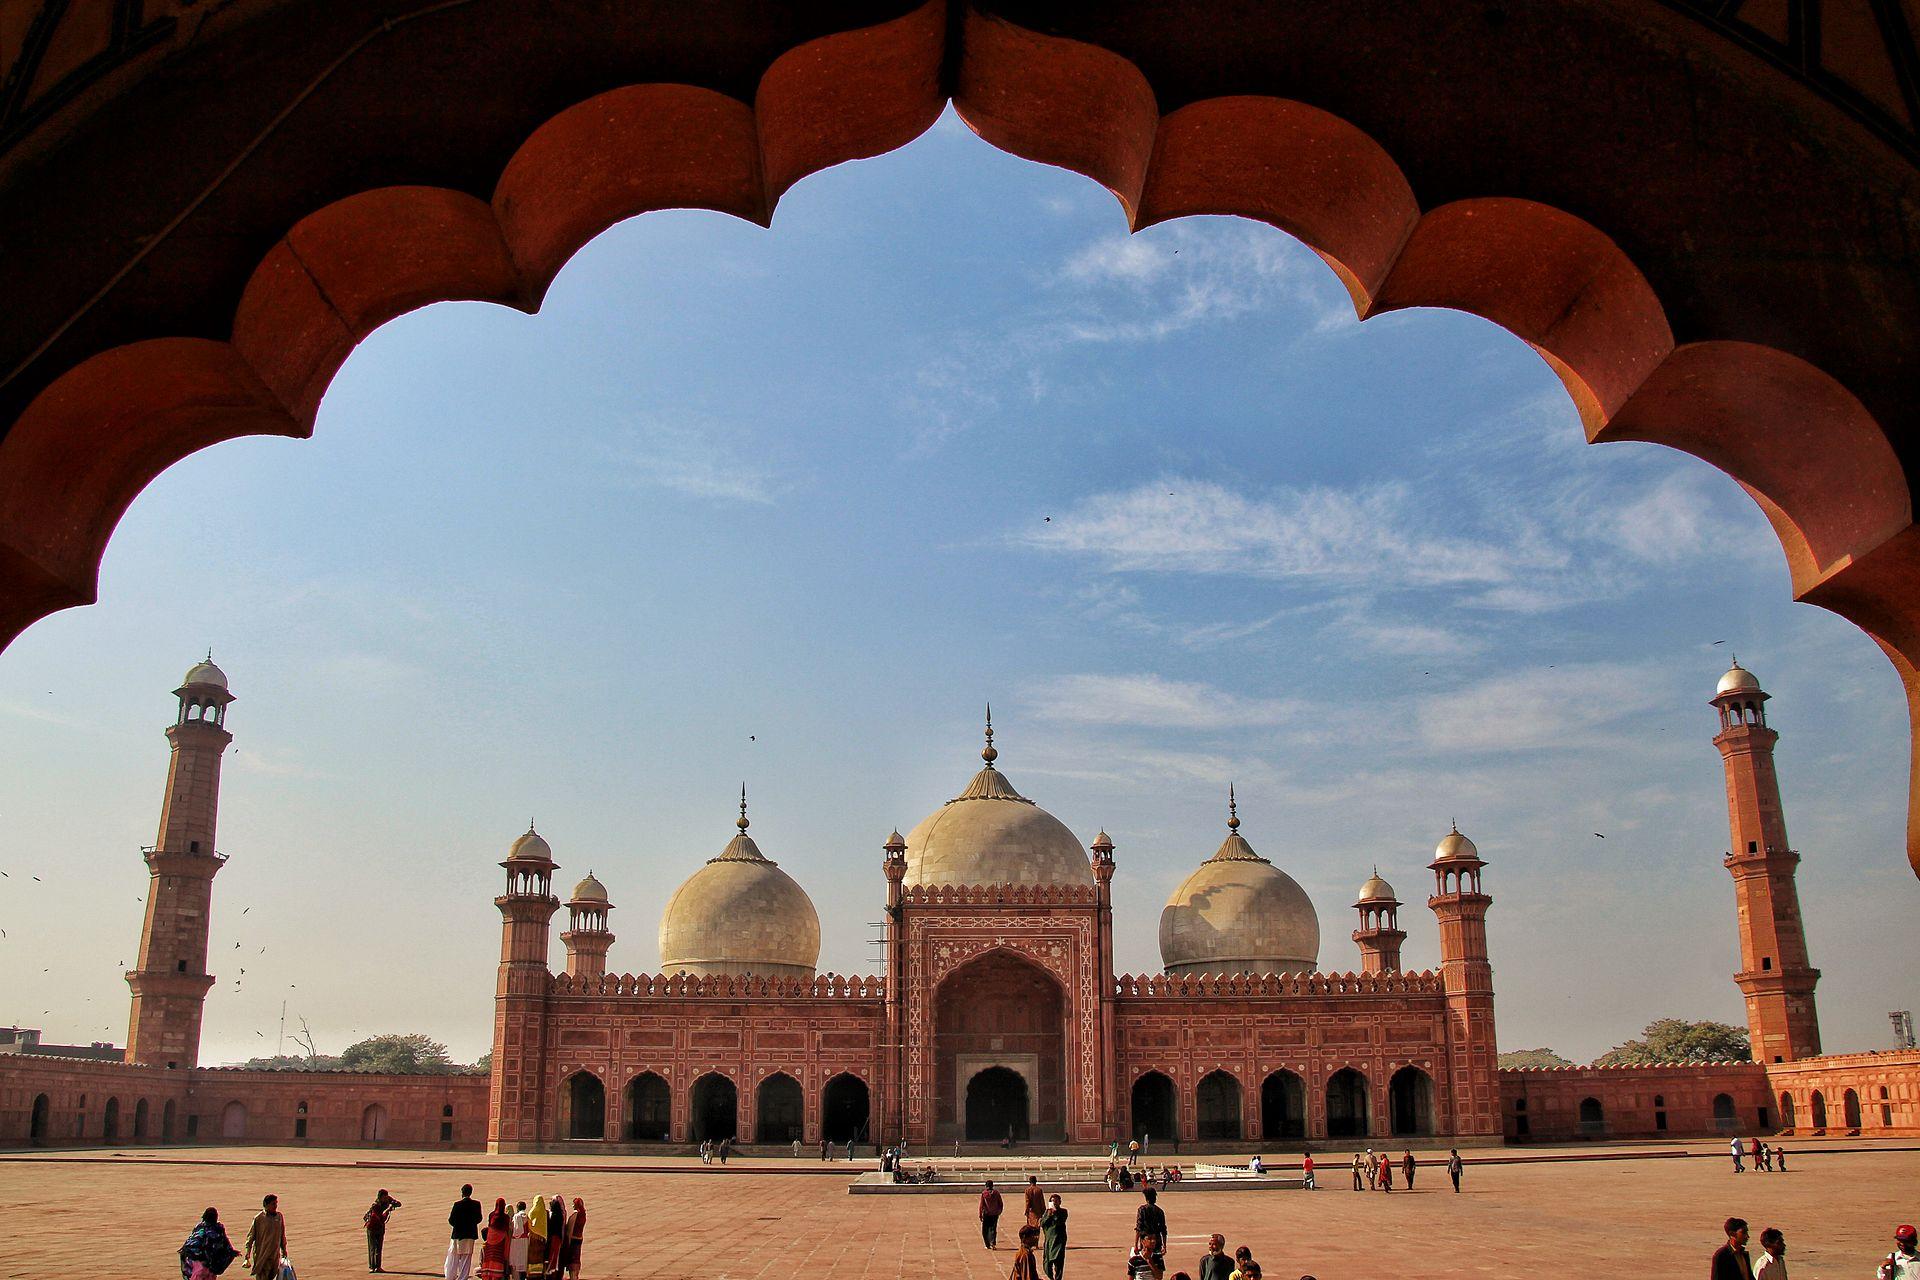 _1920px-Badshahi_Mosque_2C_Lahore_I_5102328363855997880.jpg